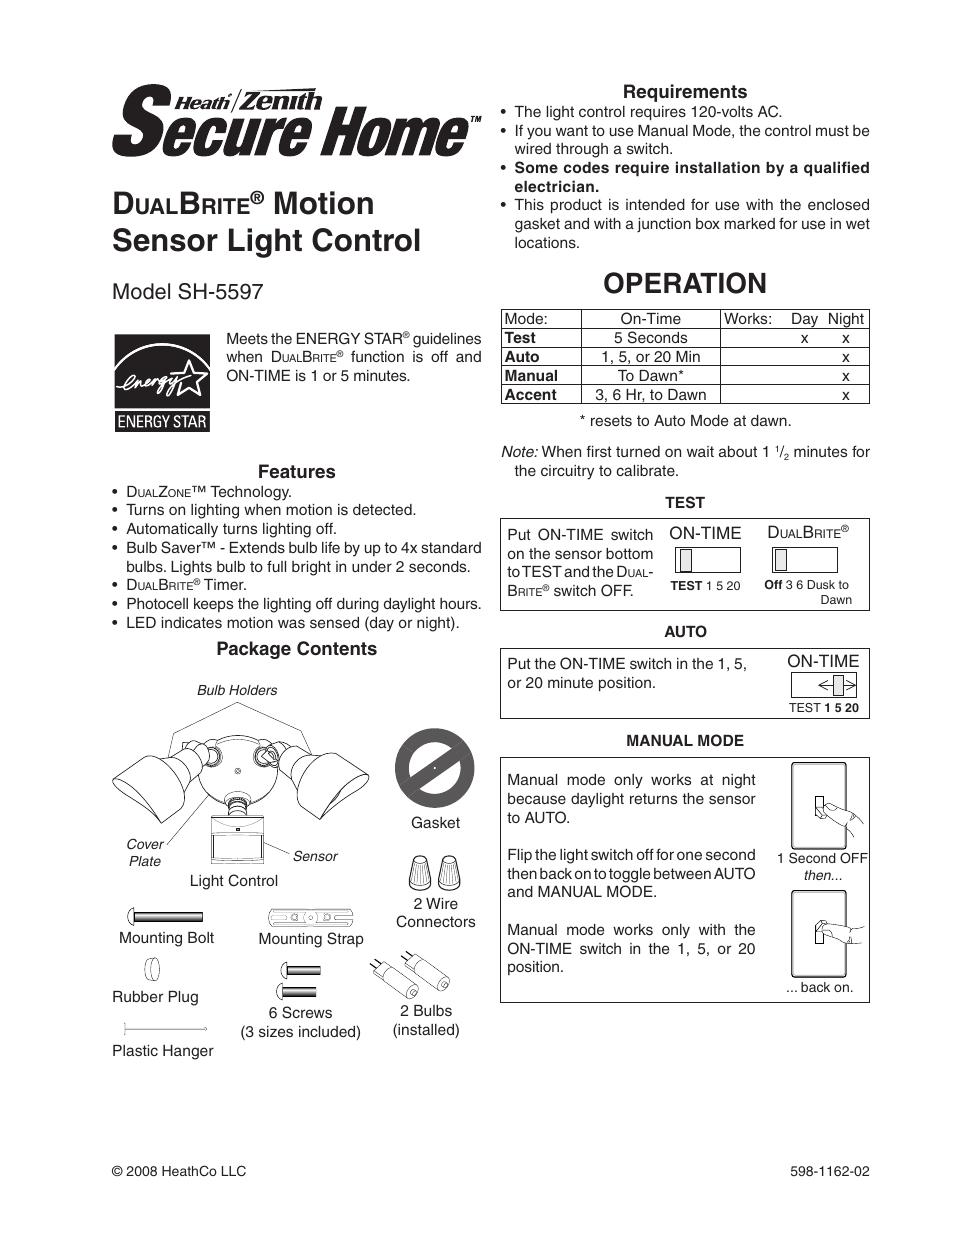 Heath Zenith Dualbrite Motion Sensor Light Control Sh 5597 User Manual 20 Pages